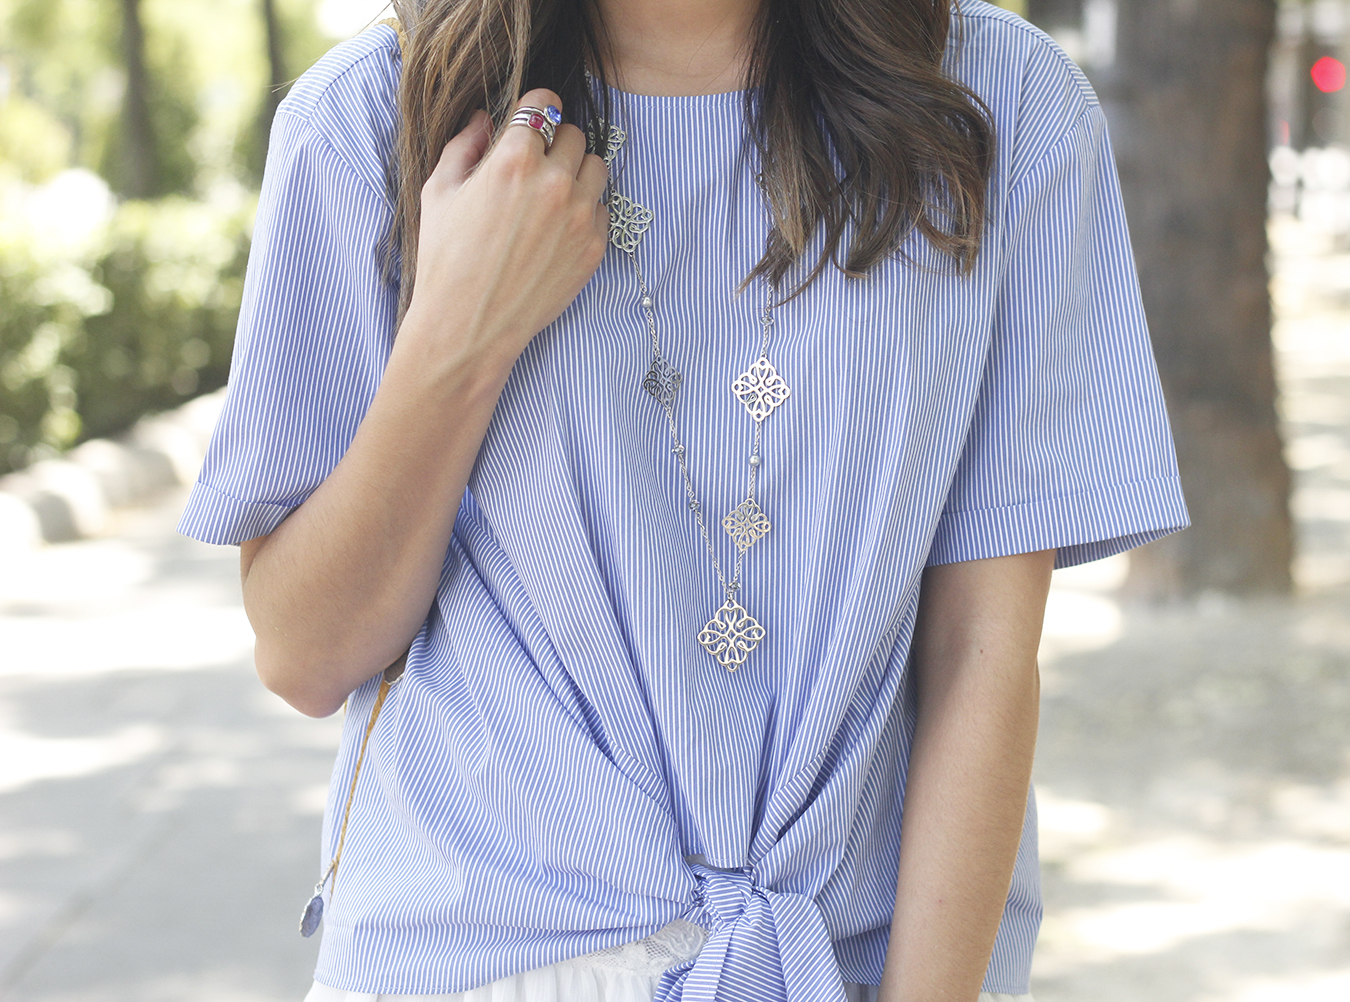 Knotted striped shirt white skirt brosway jewels summer outfit carolina herrera heelsfashion style18